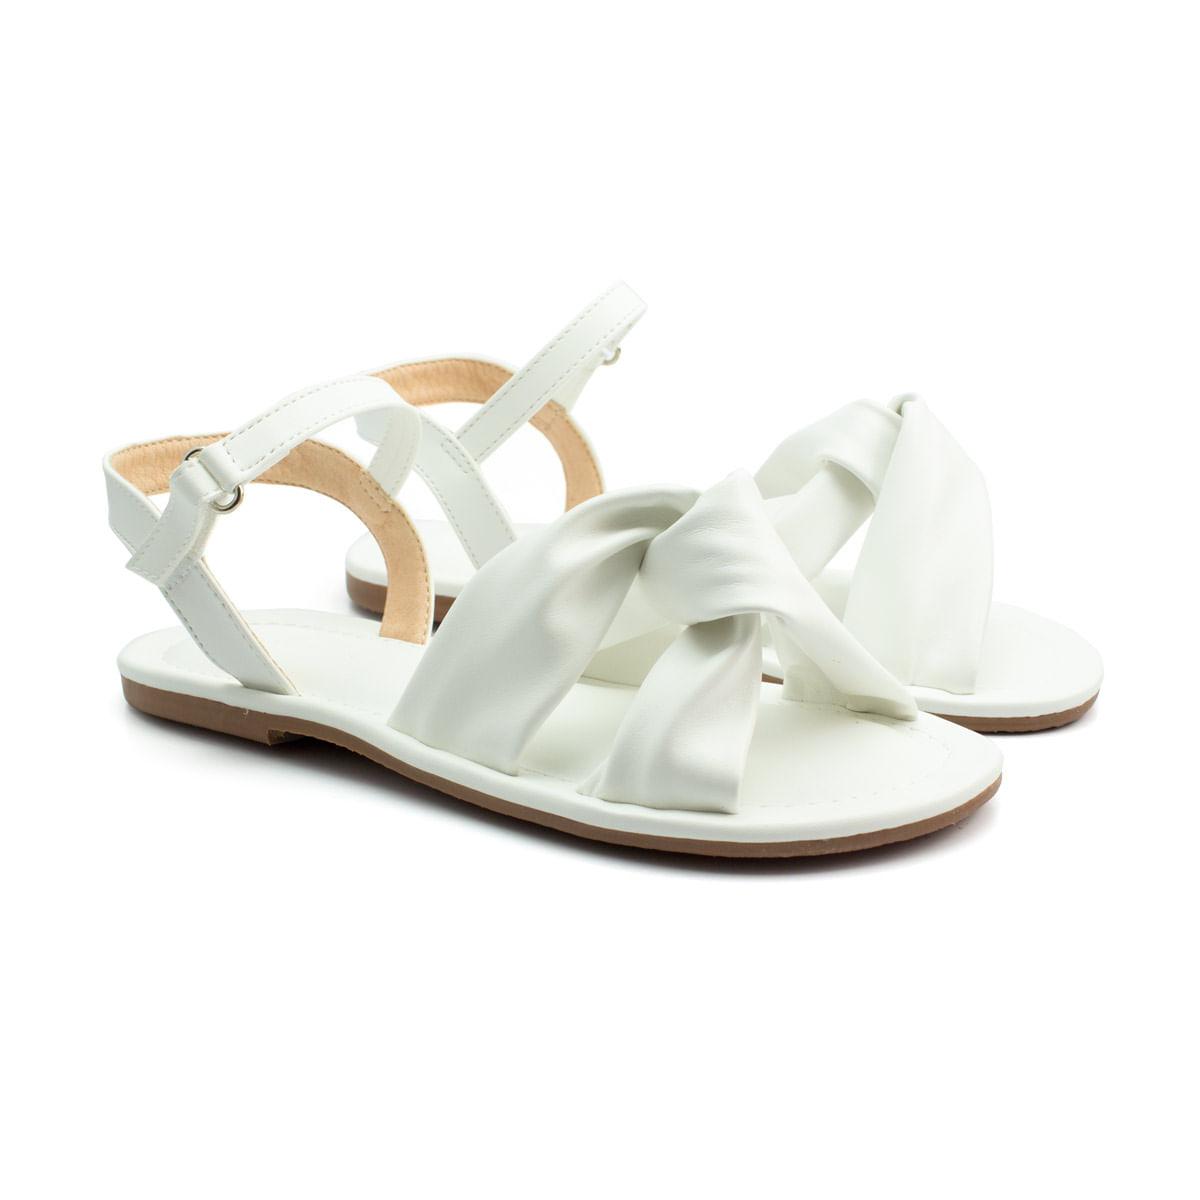 Sandalia-Flat-Infantil-Menina-Tiras-Twist-Ludique-et-Badin--28-ao-37--977-11853--VER21-